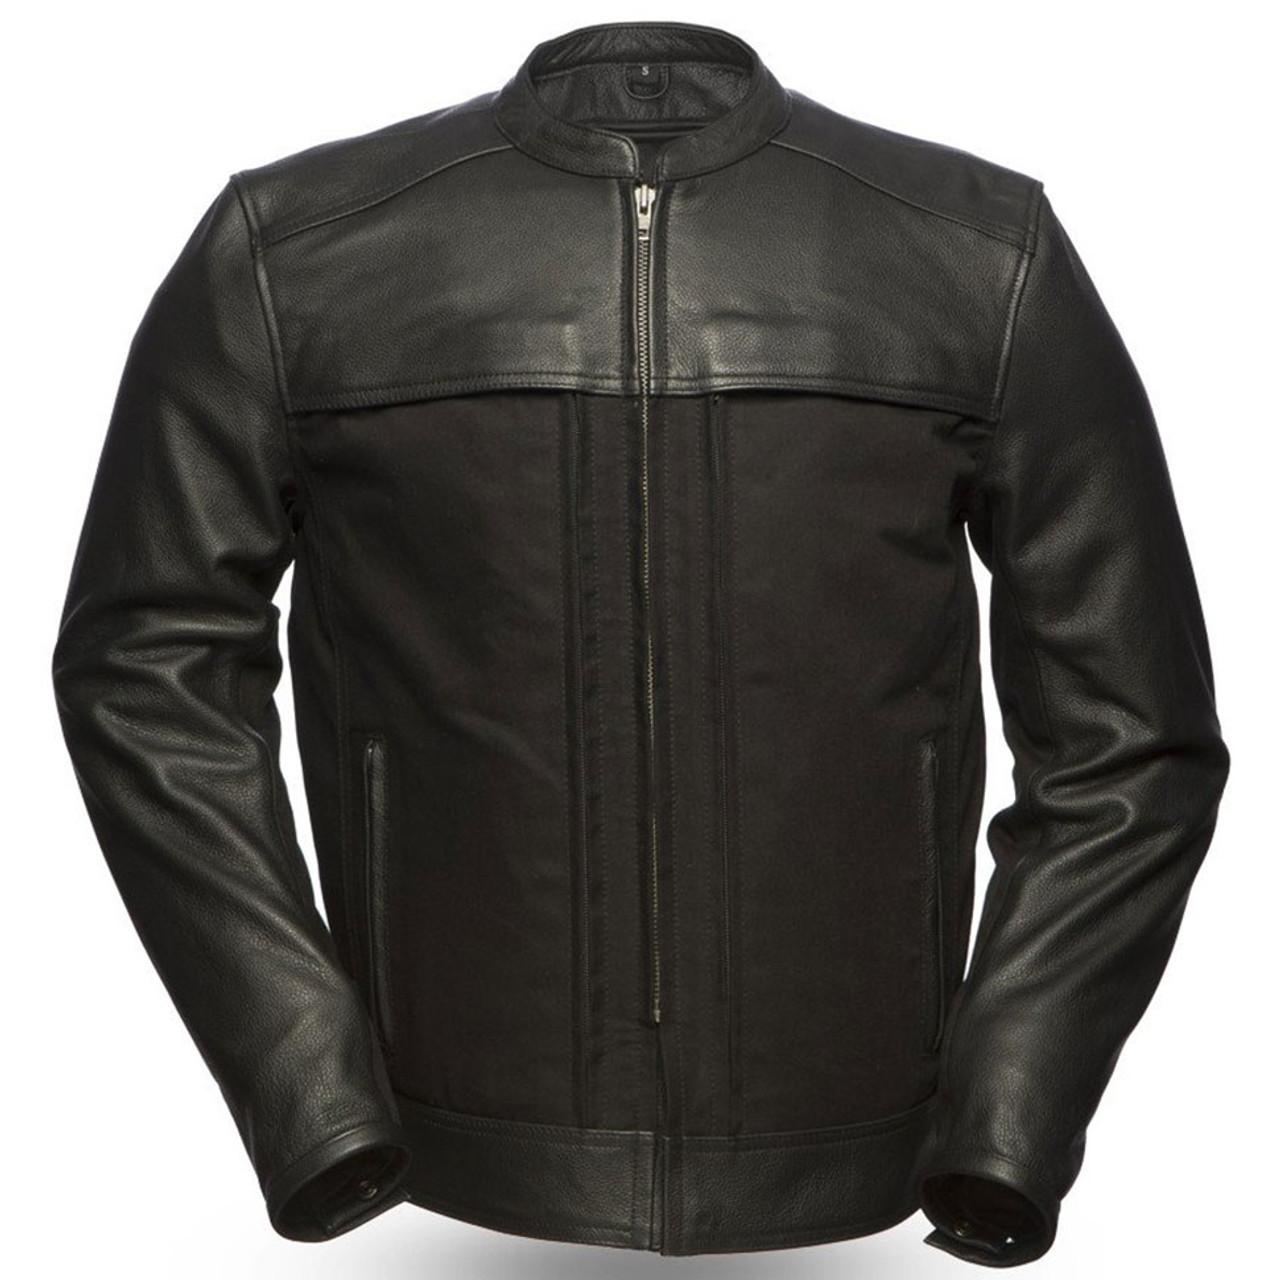 First Mfg Men Milestone Leather Motorcycle Riding Shirt Black S-5XL Free Ship